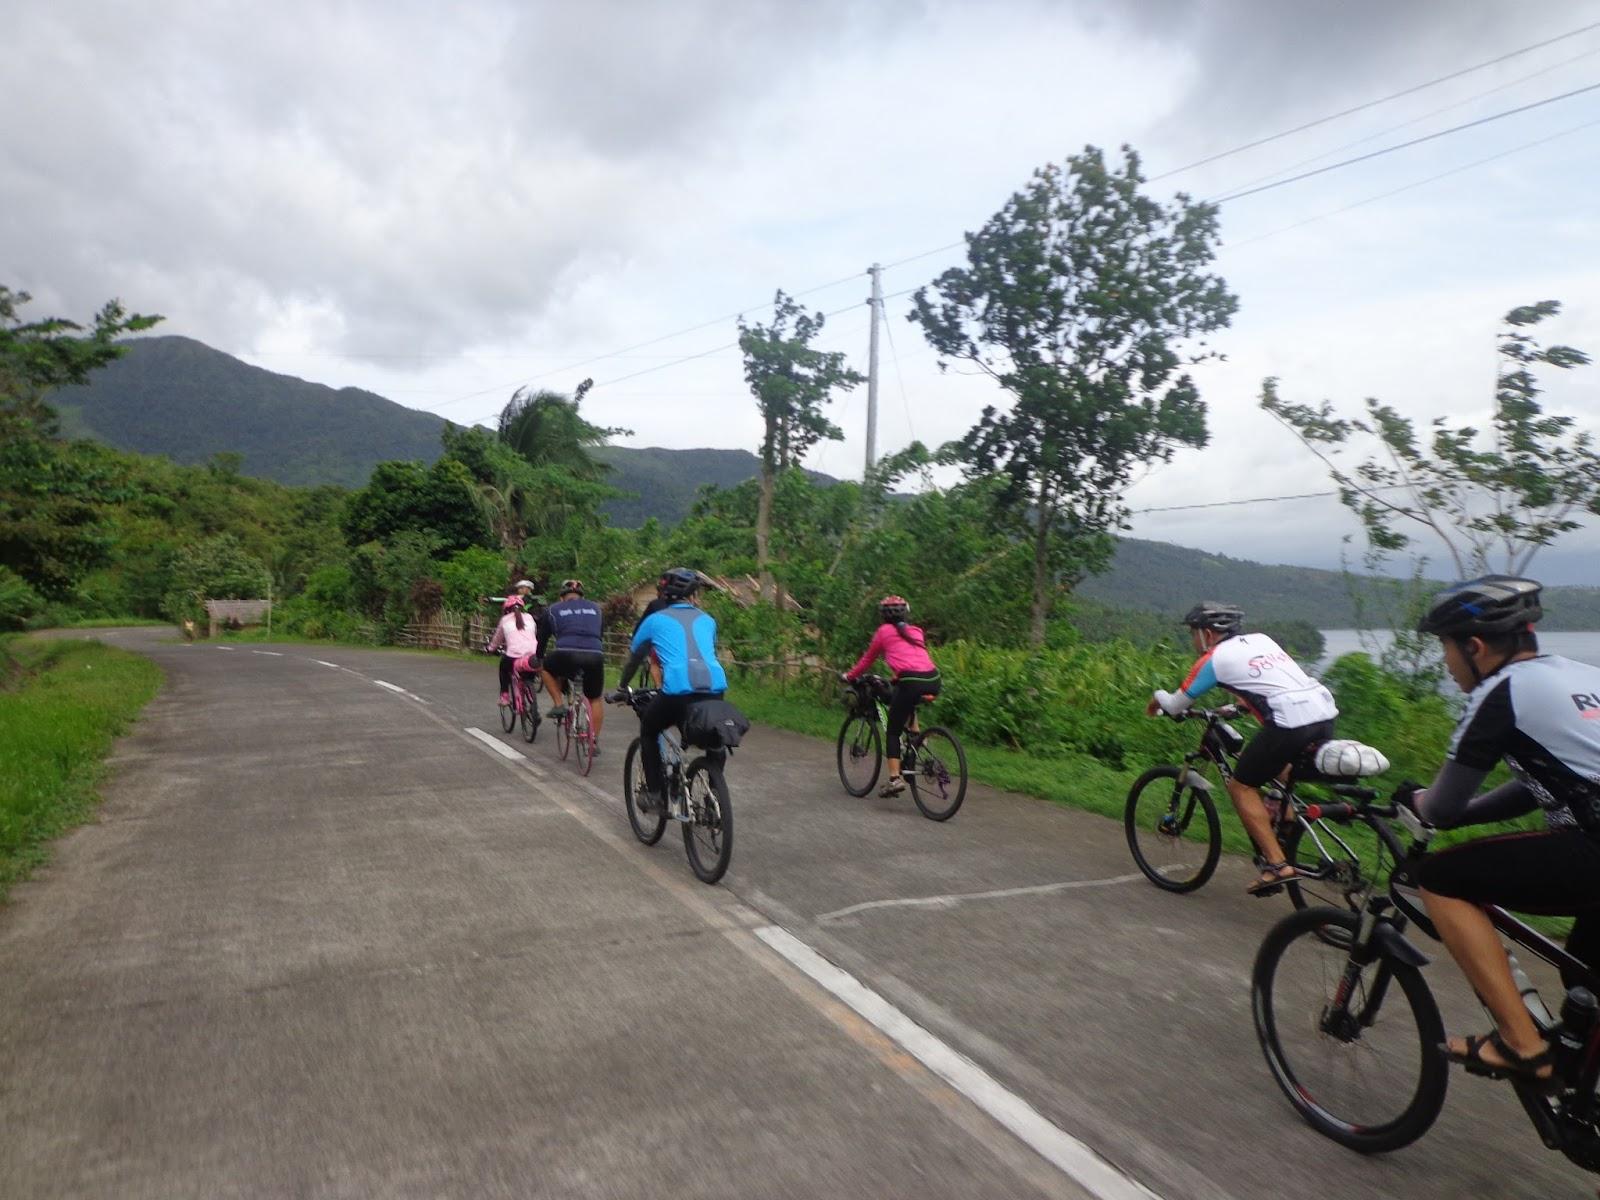 bikepacking philippines: tiwi and caramoan bike ride 2015